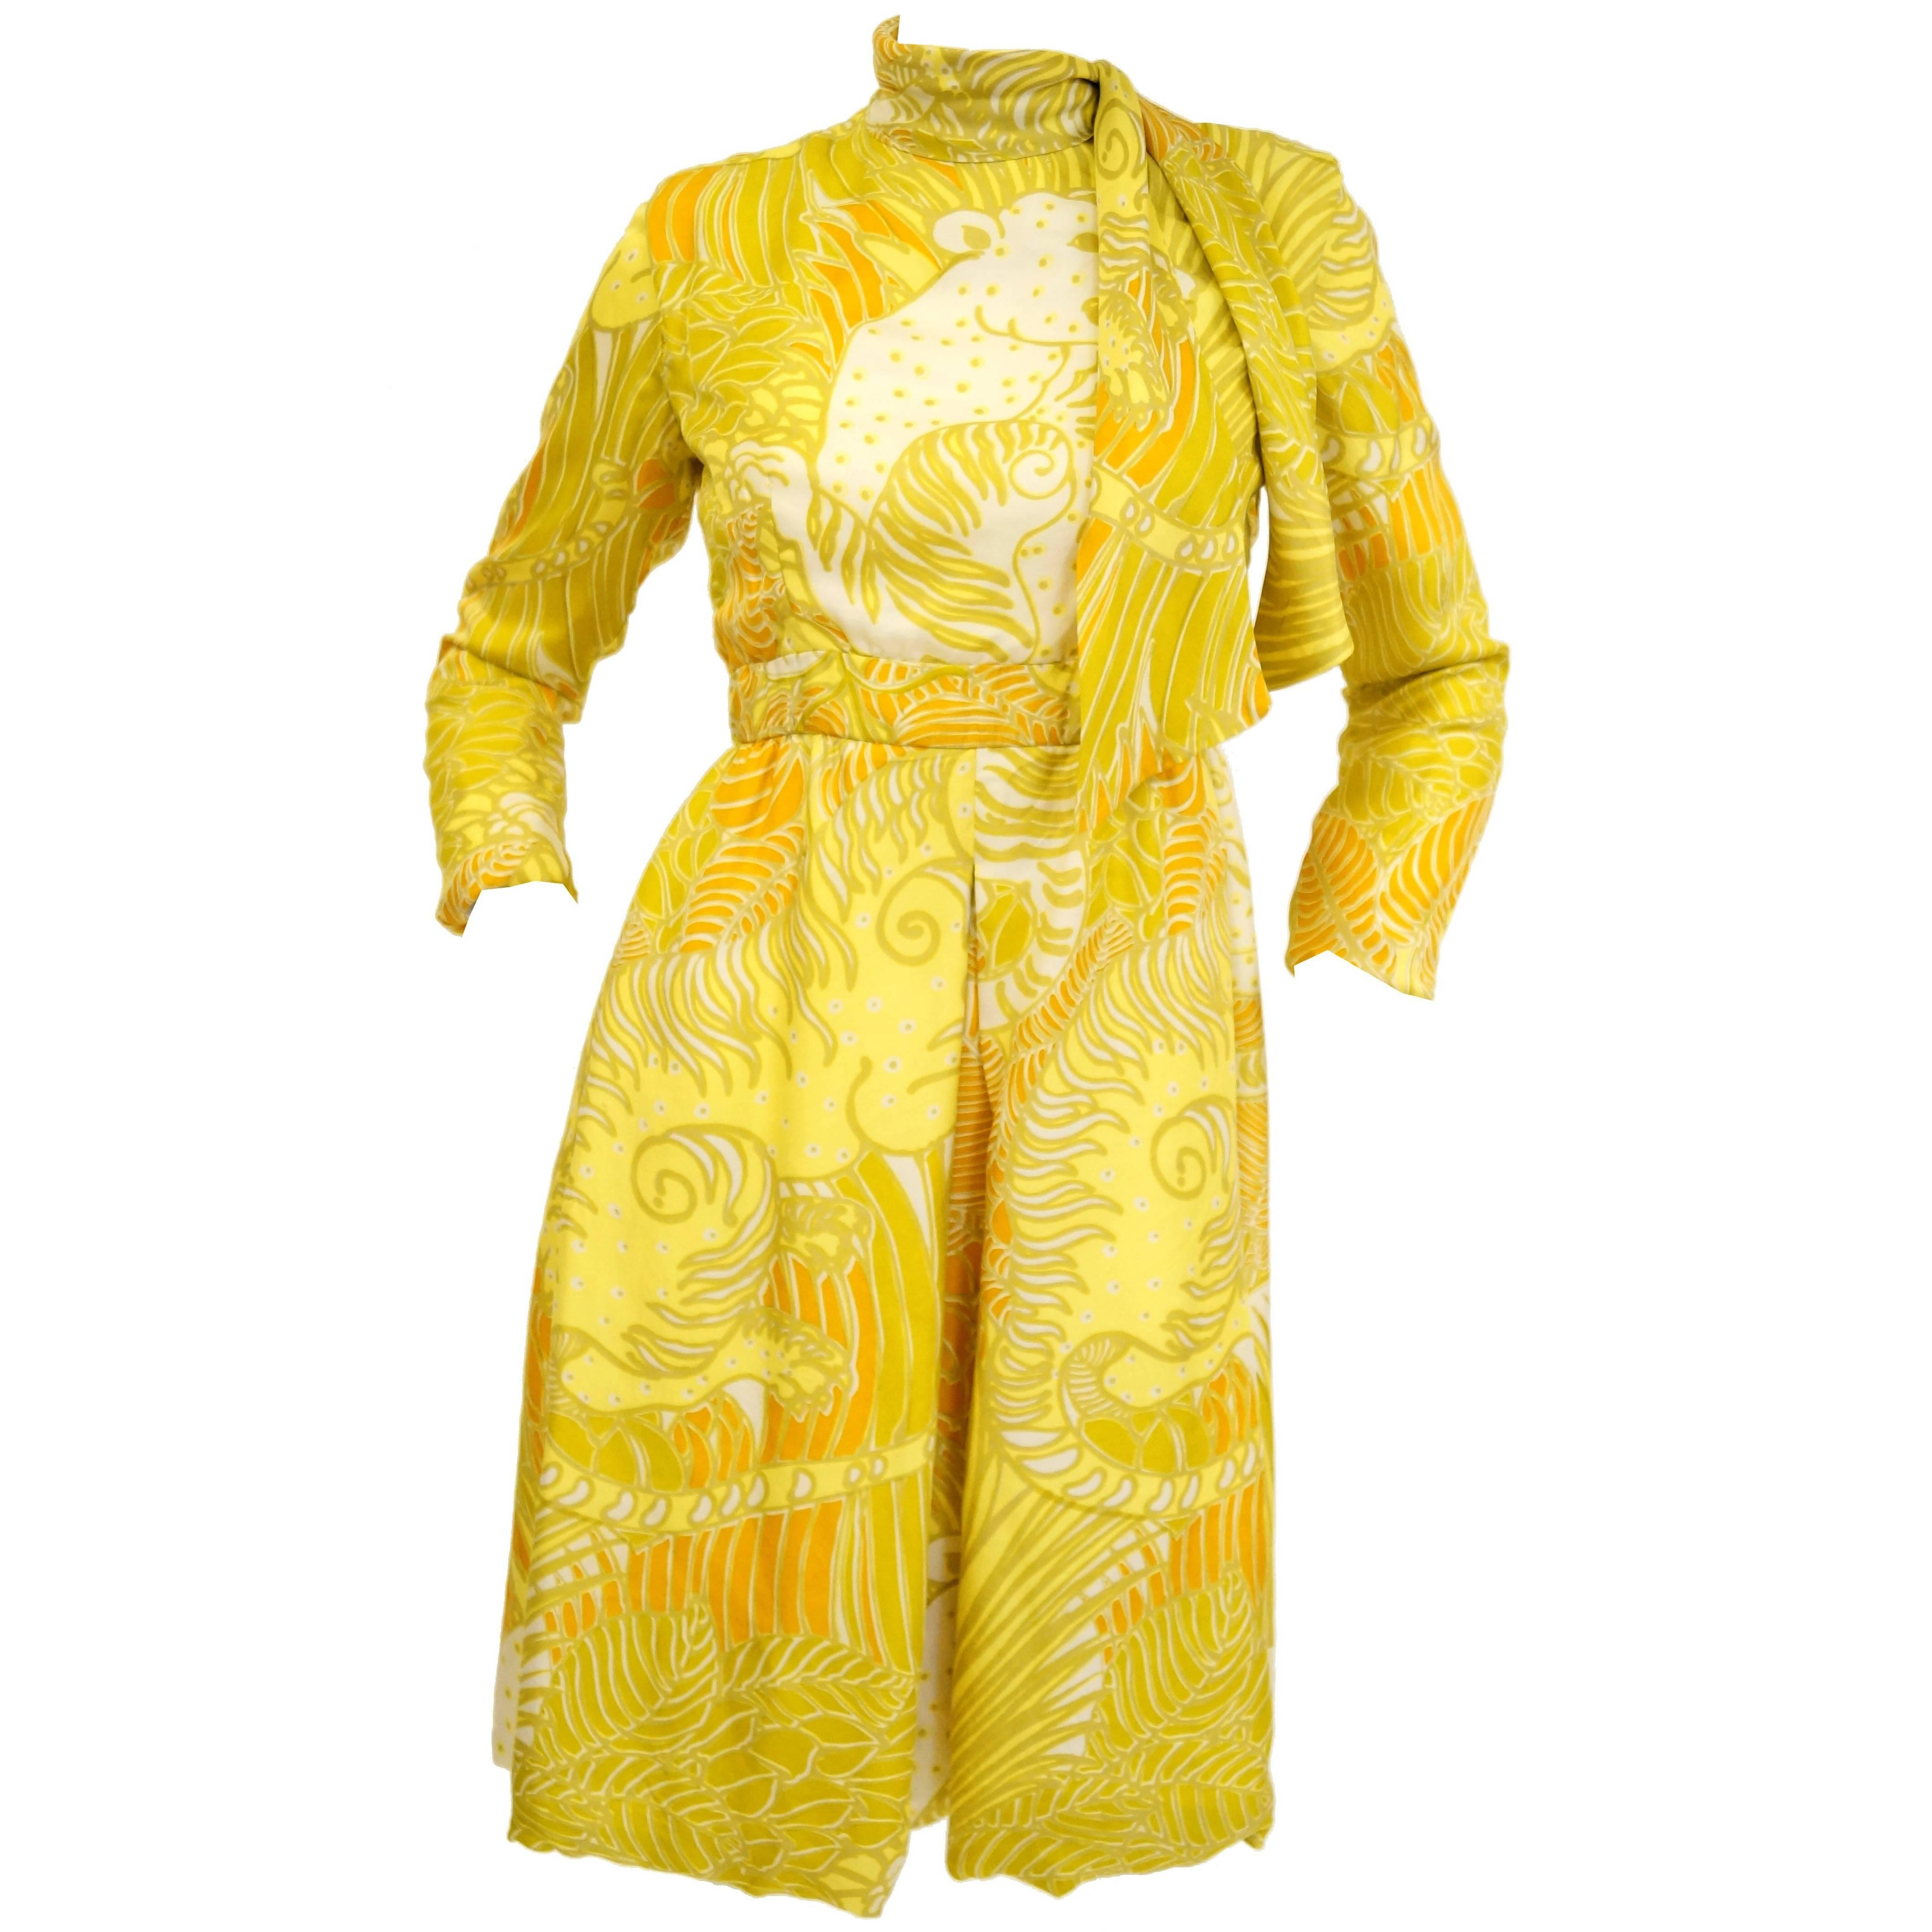 1960s George Halley Citrine Yellow Grinning Tiger Dress